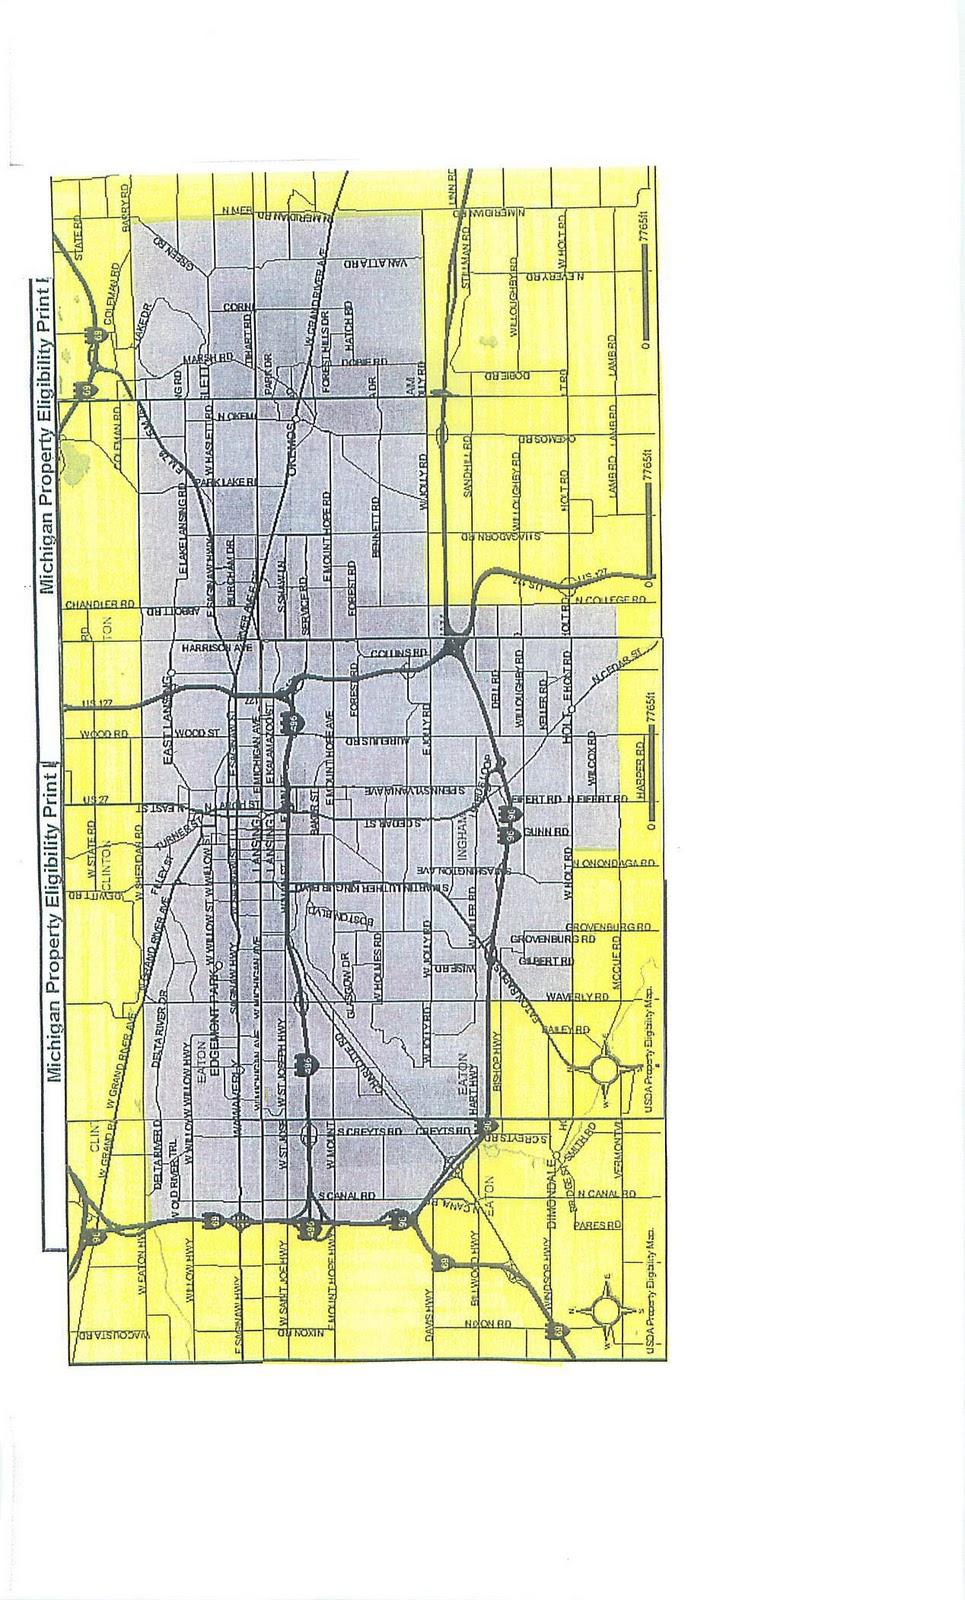 Loan Program For Buyers - Rural development loan michigan map